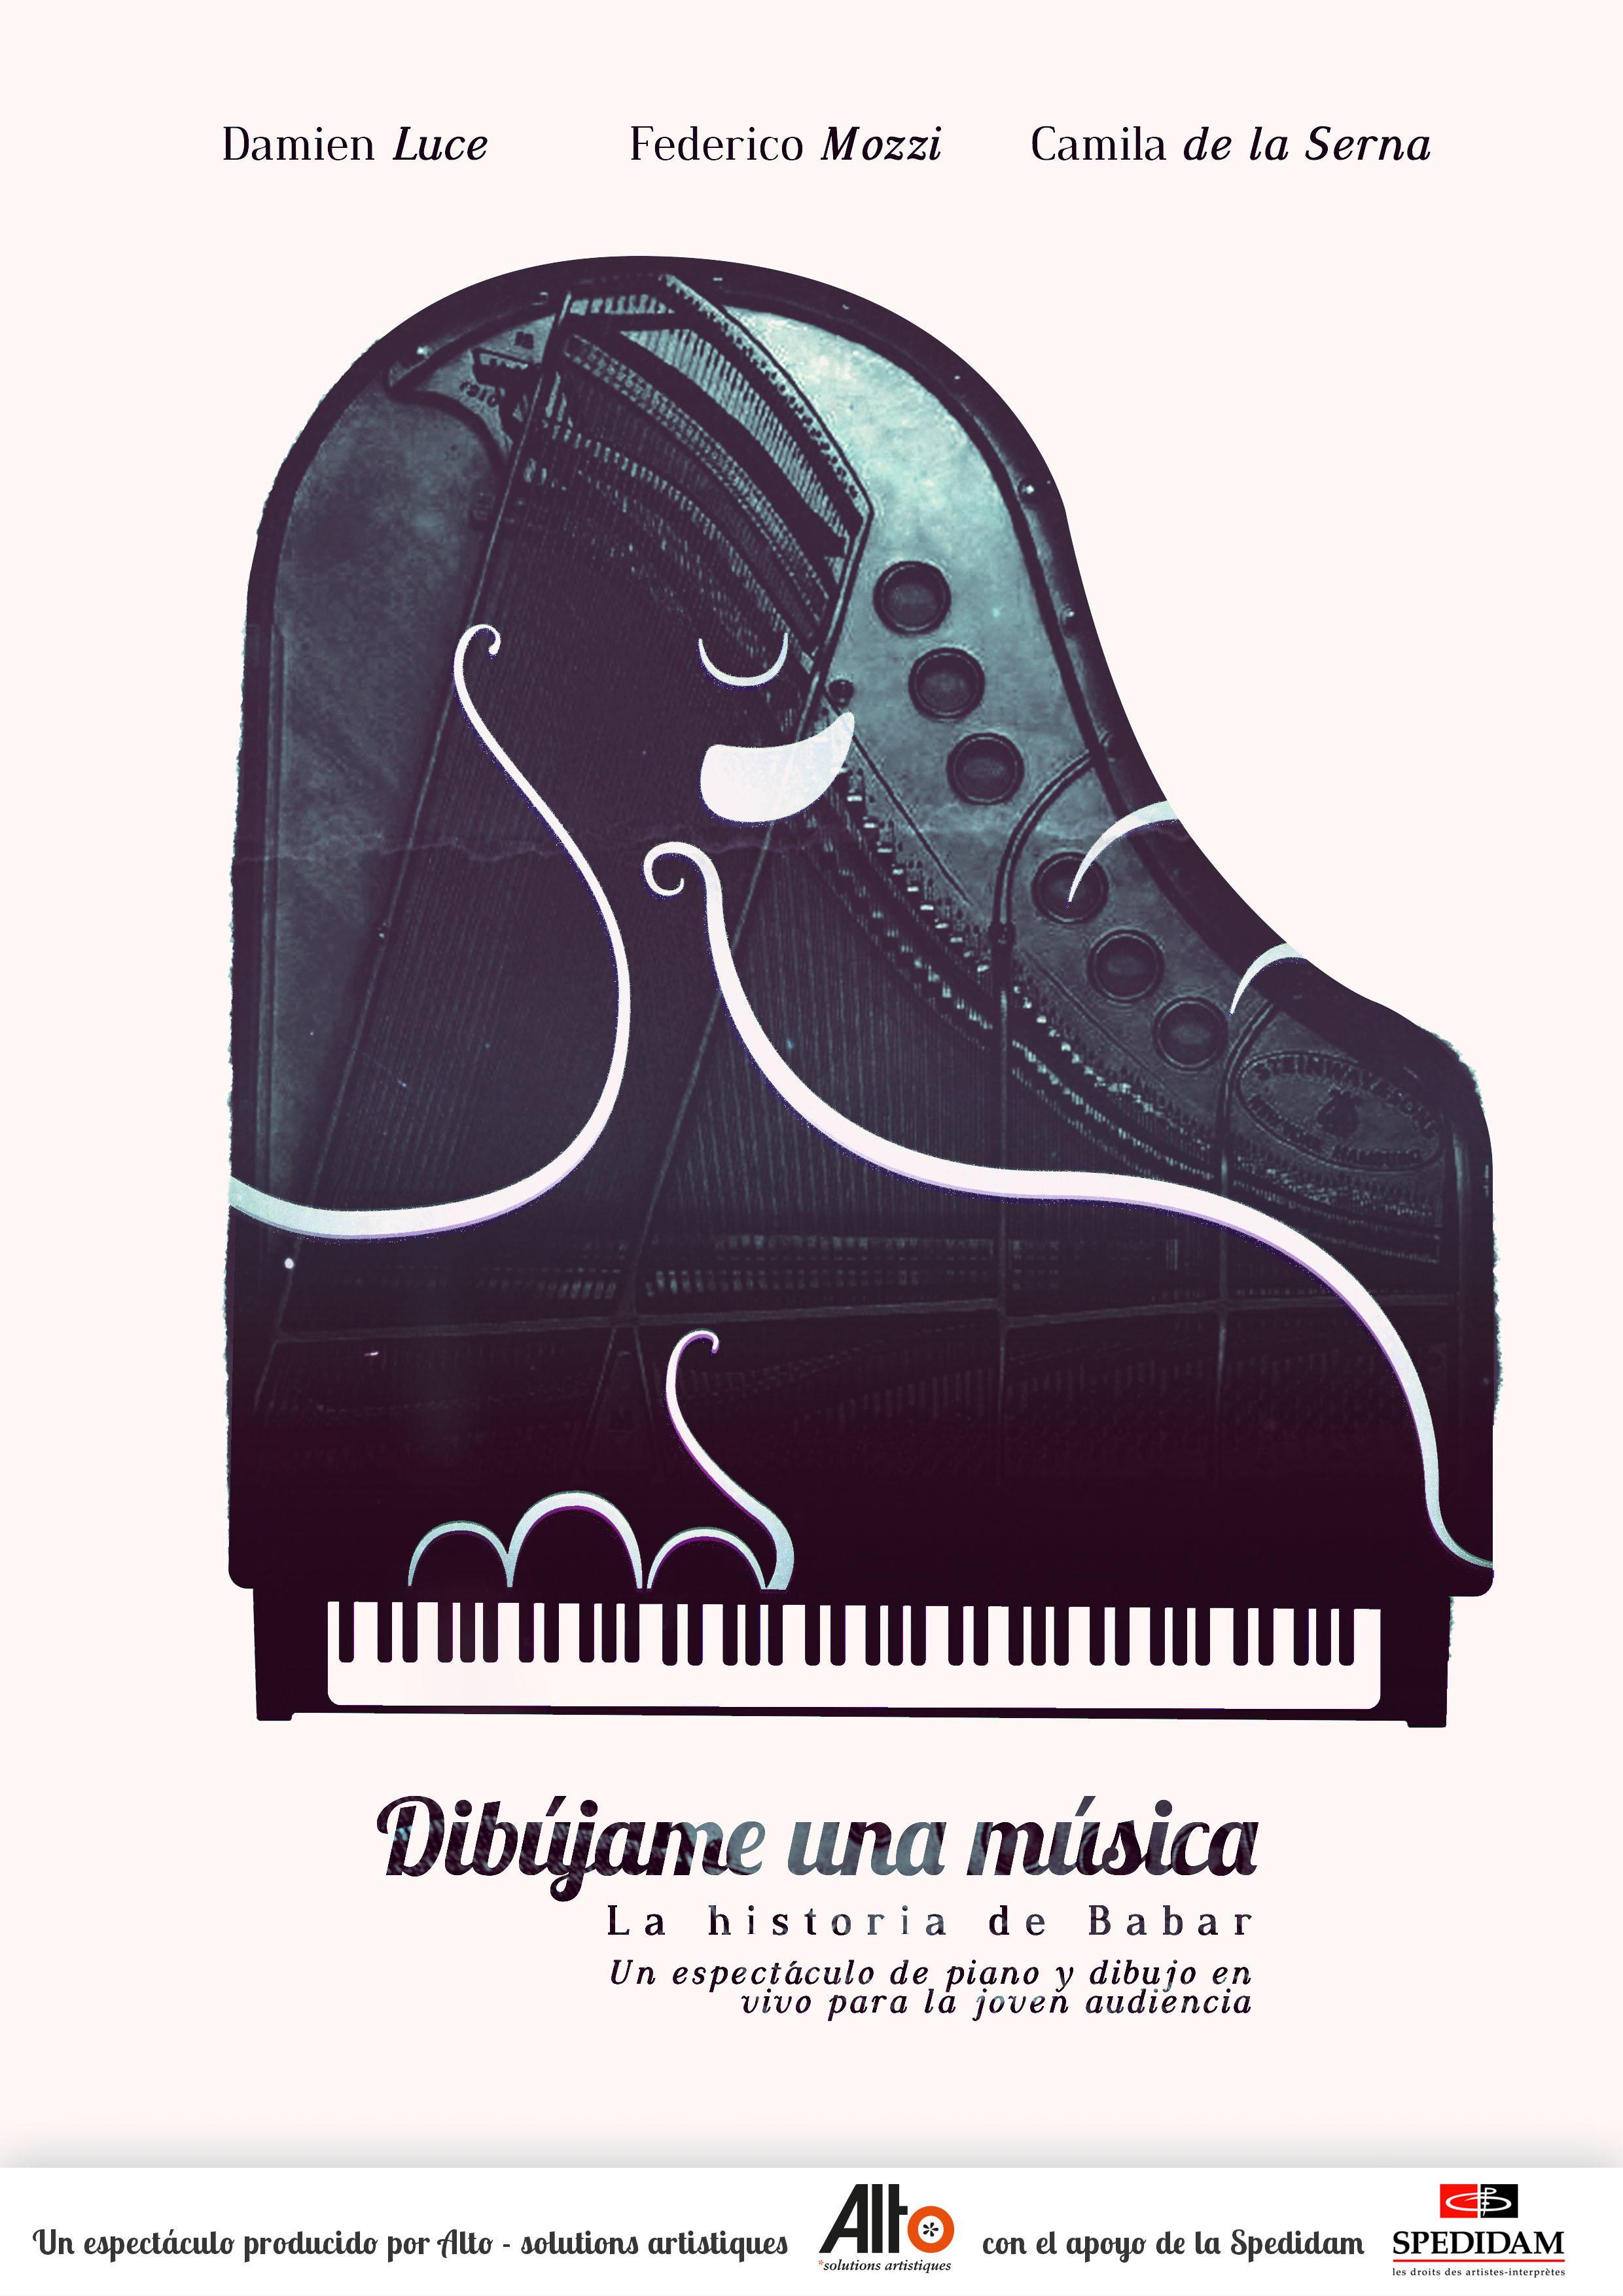 visuel_dessine_moi_une_musique_espagnol